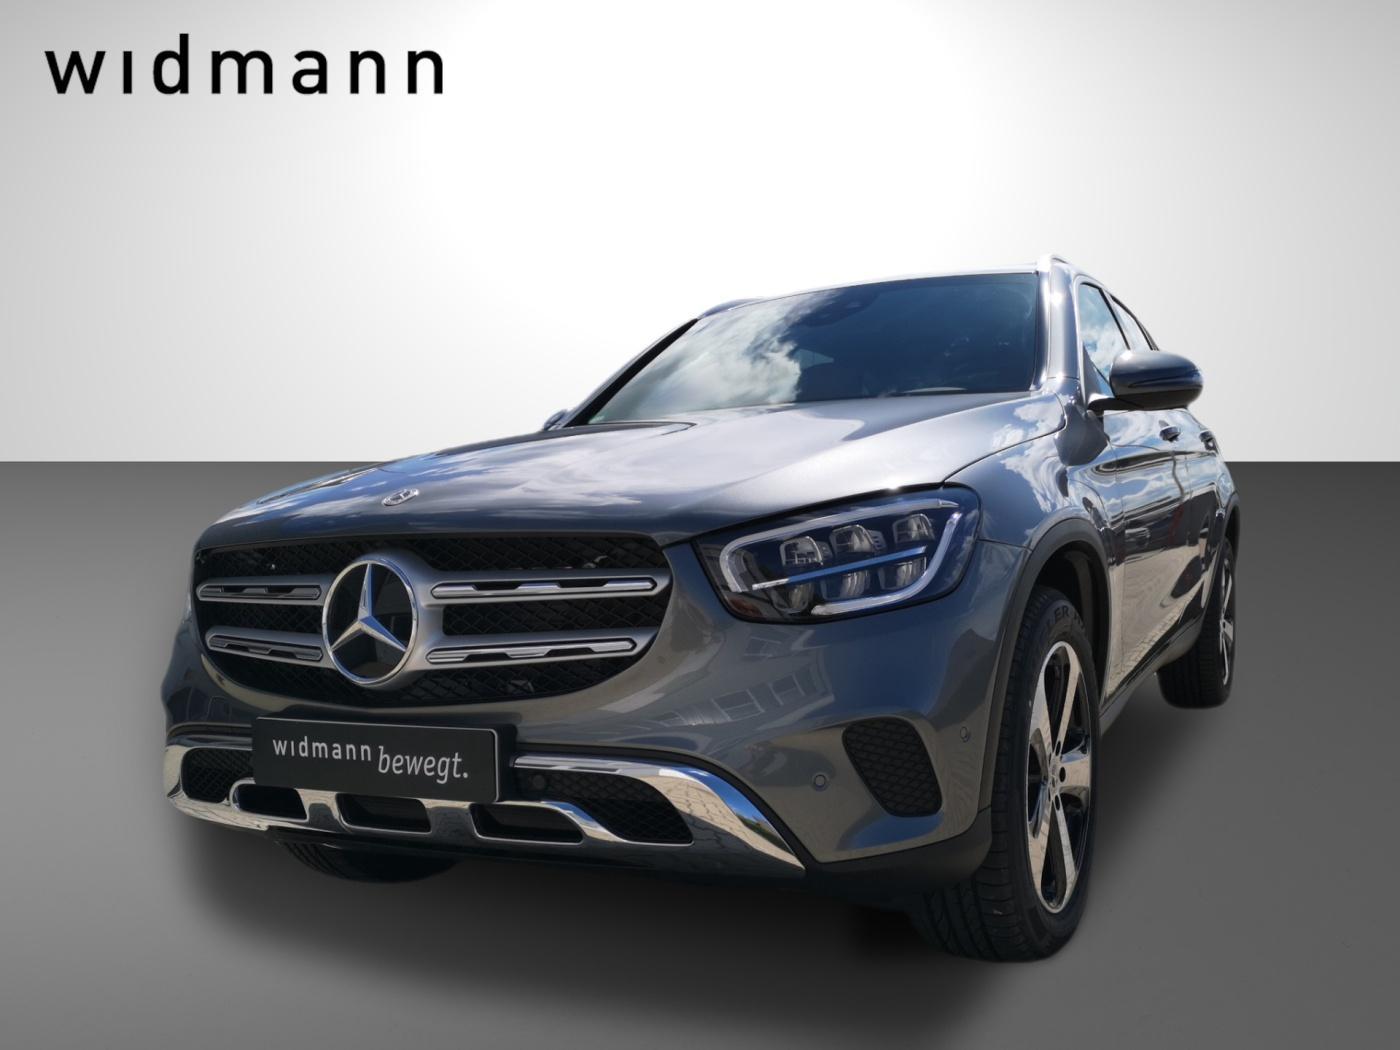 Mercedes-Benz GLC 400 d 4MATIC *LED*Kamera*PDC*Parkassist.*, Jahr 2021, Diesel